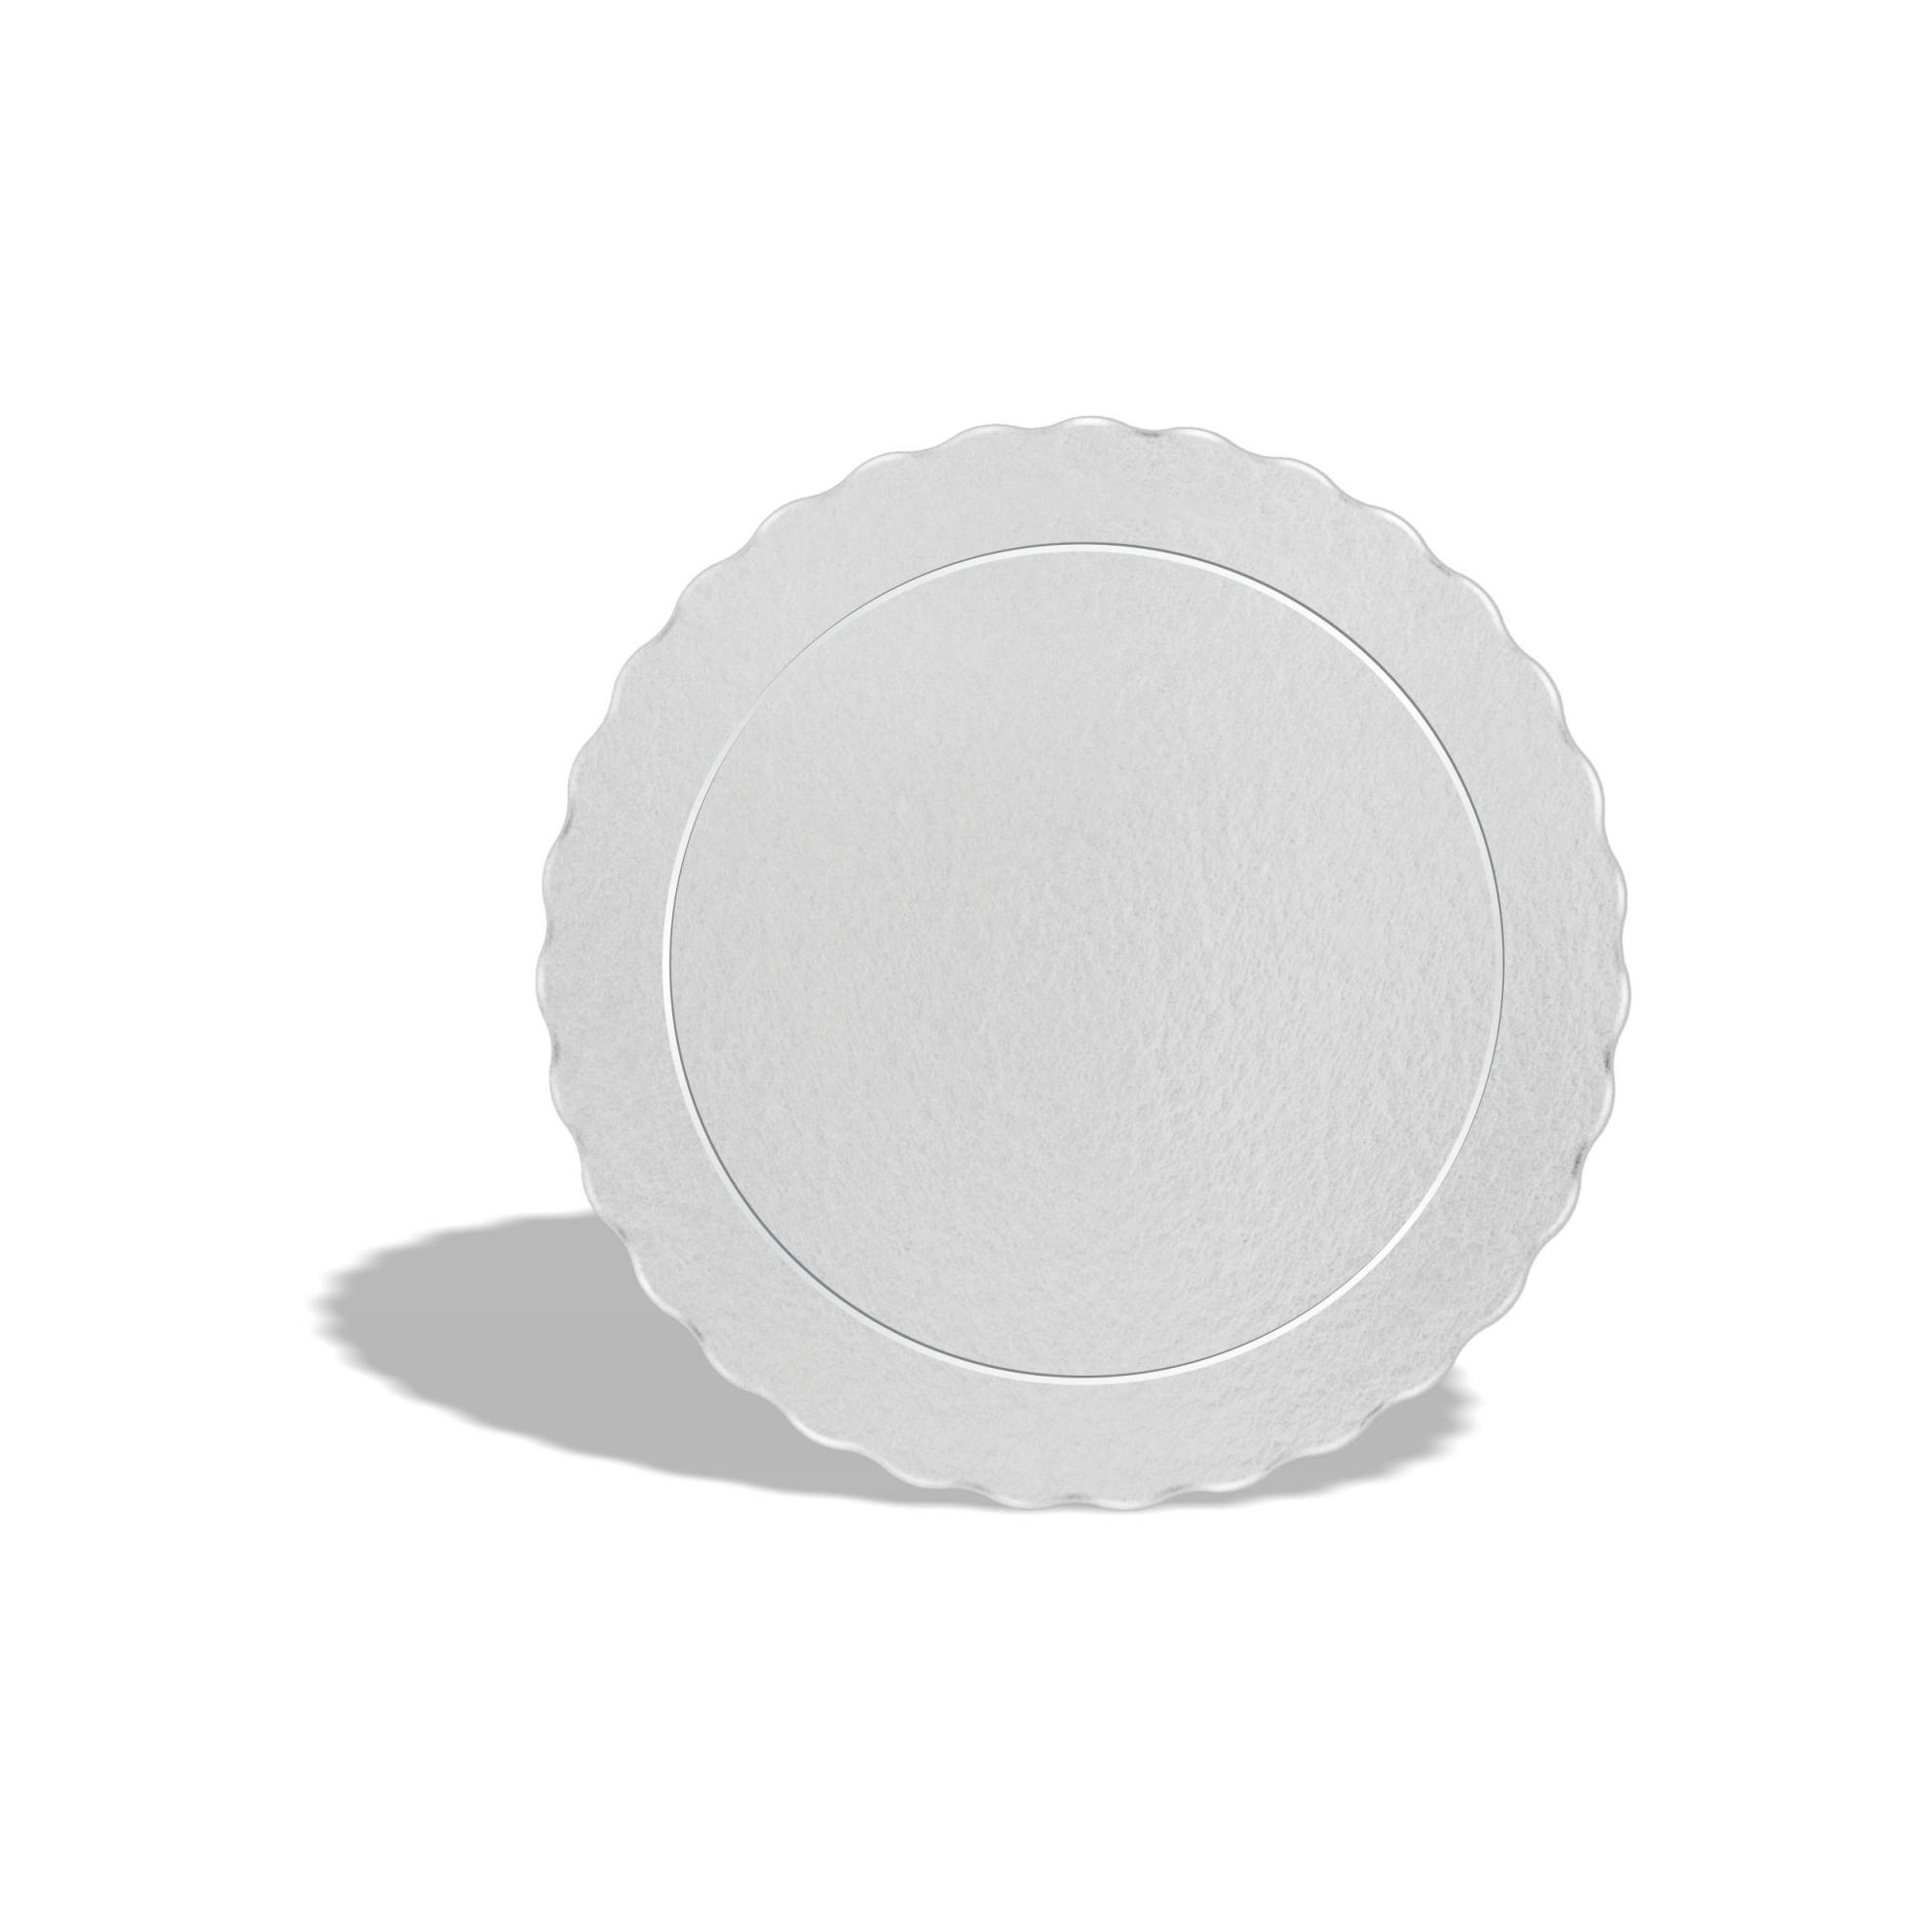 200 Bases Laminadas, Suporte P/ Bolo, Cake Board, 17cm - Branco